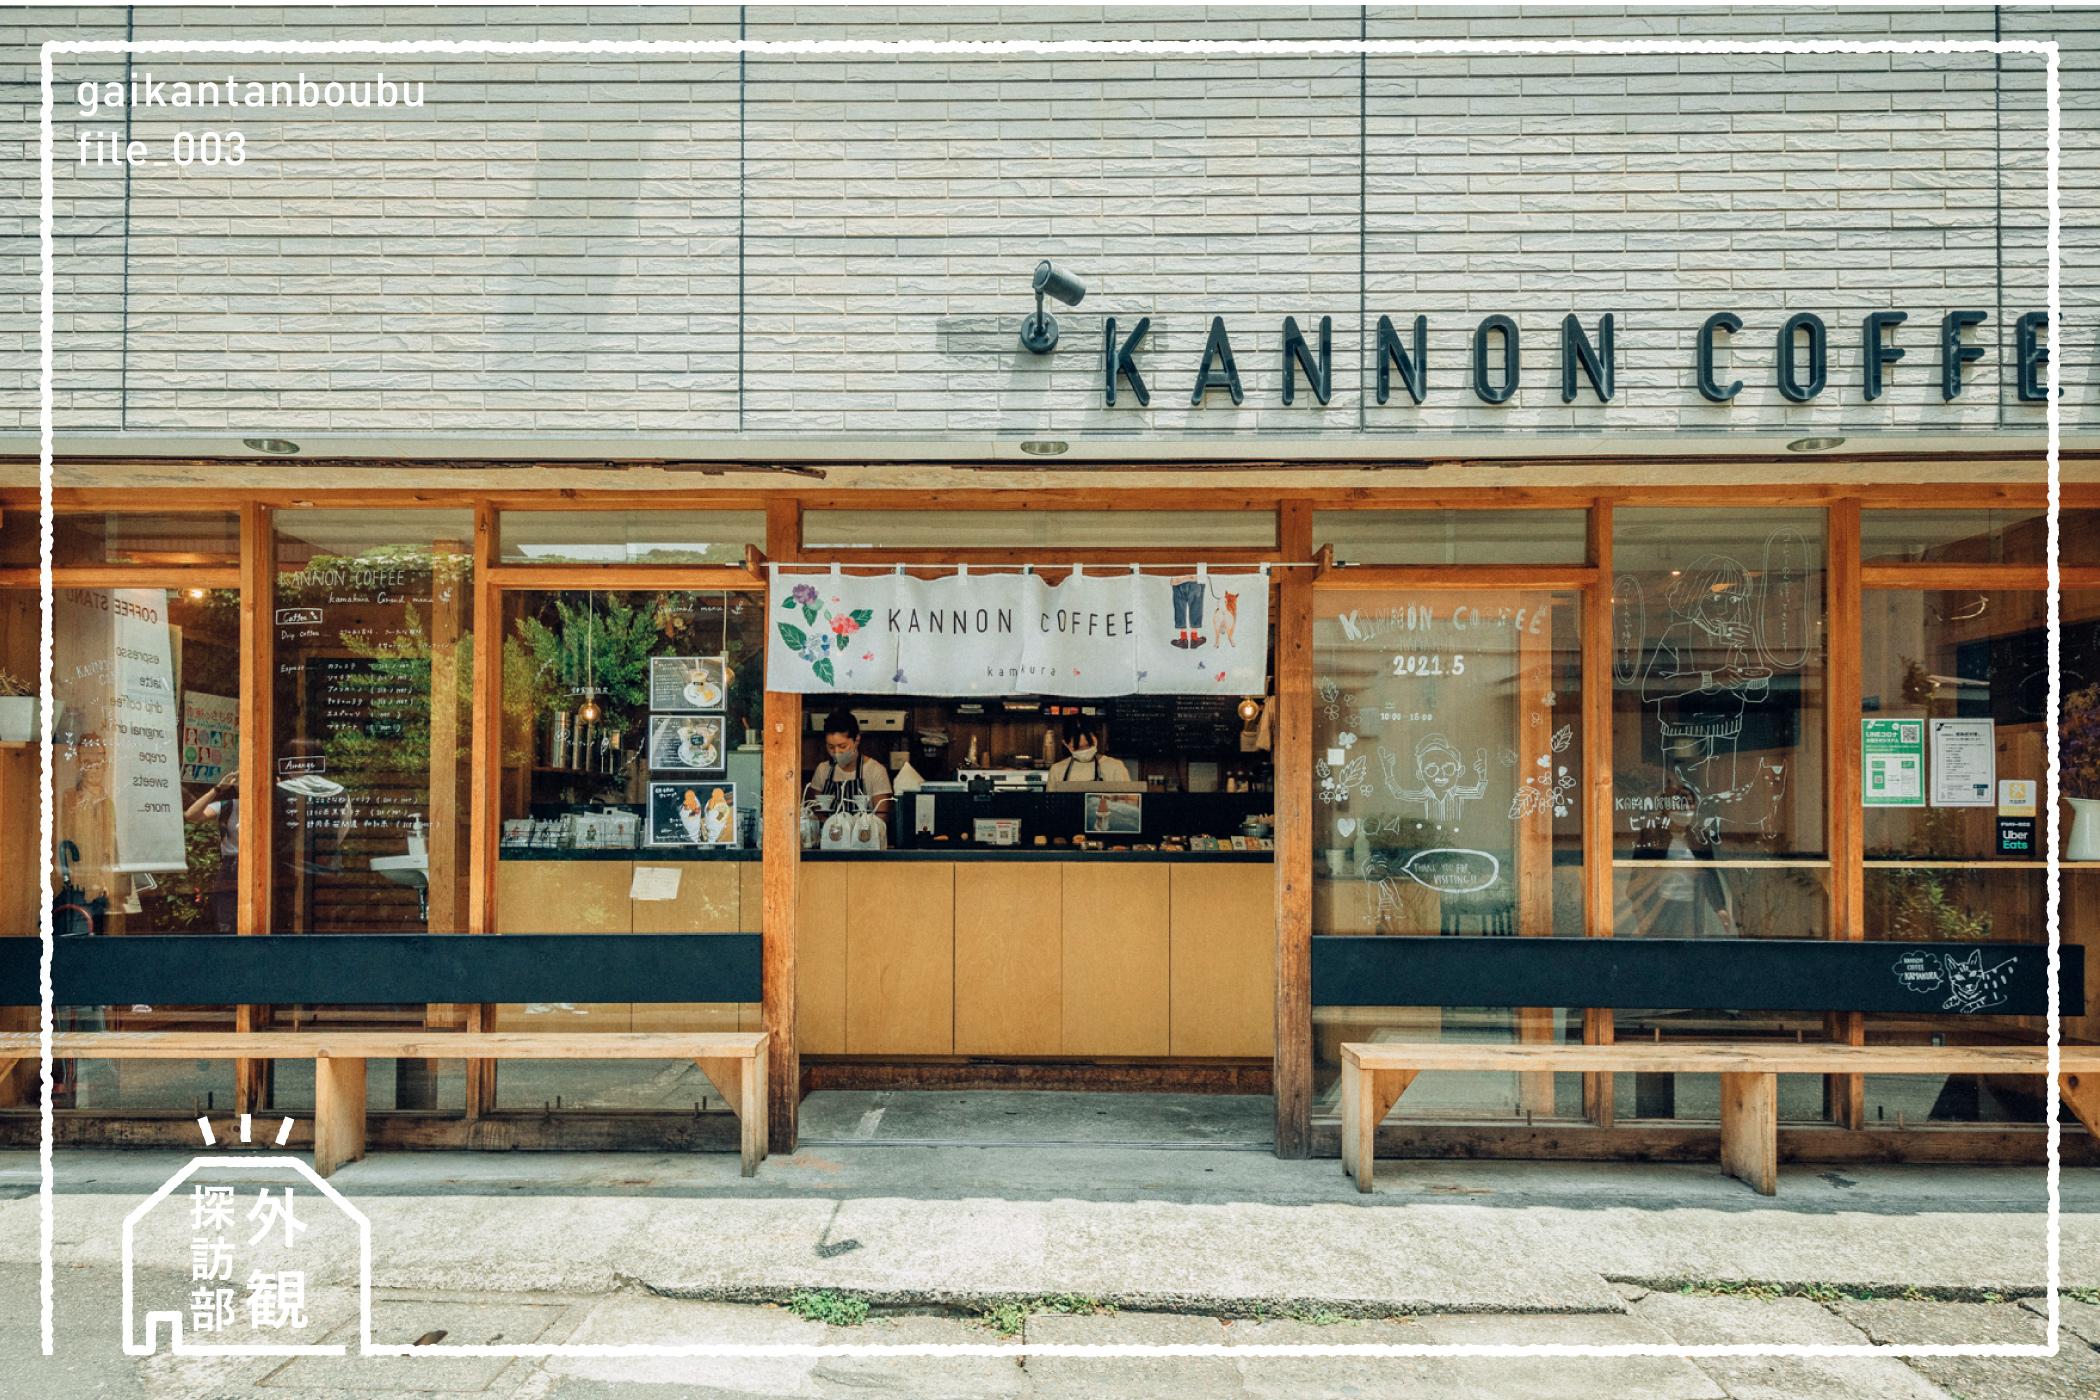 kannoncoffee,カンノンコーヒー, KANNON COFFEE Kamakura,カンノンコーヒー鎌倉